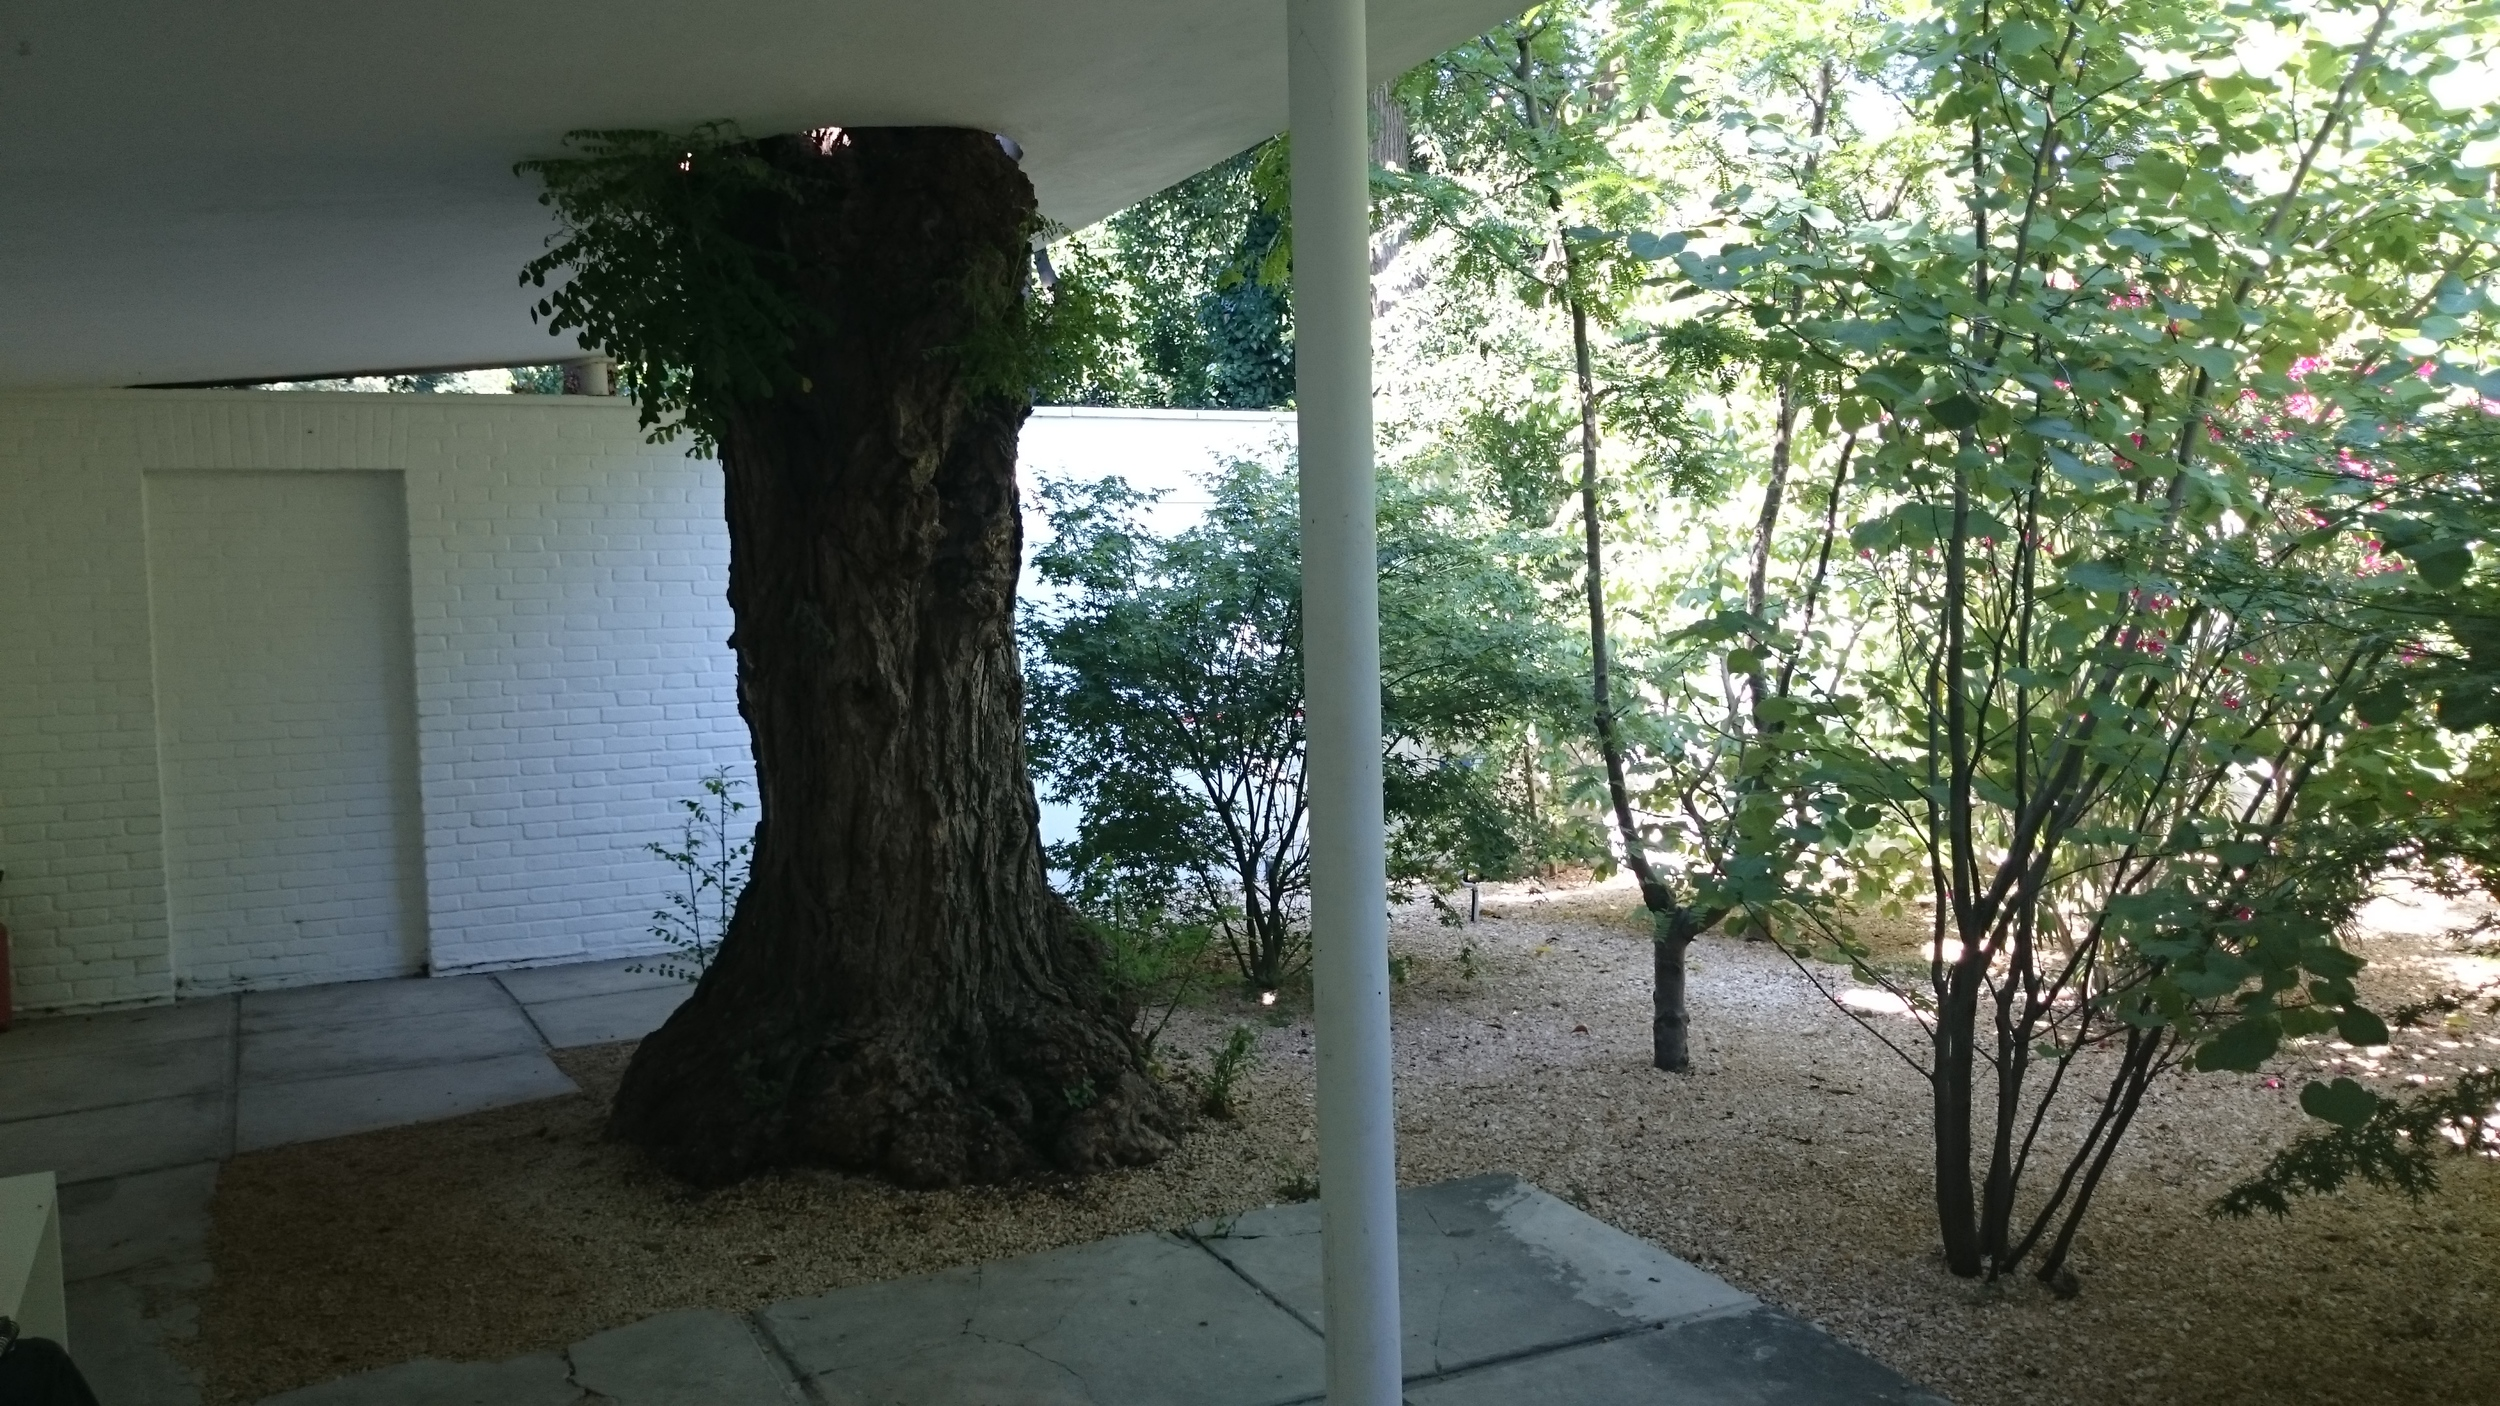 Tree penetration